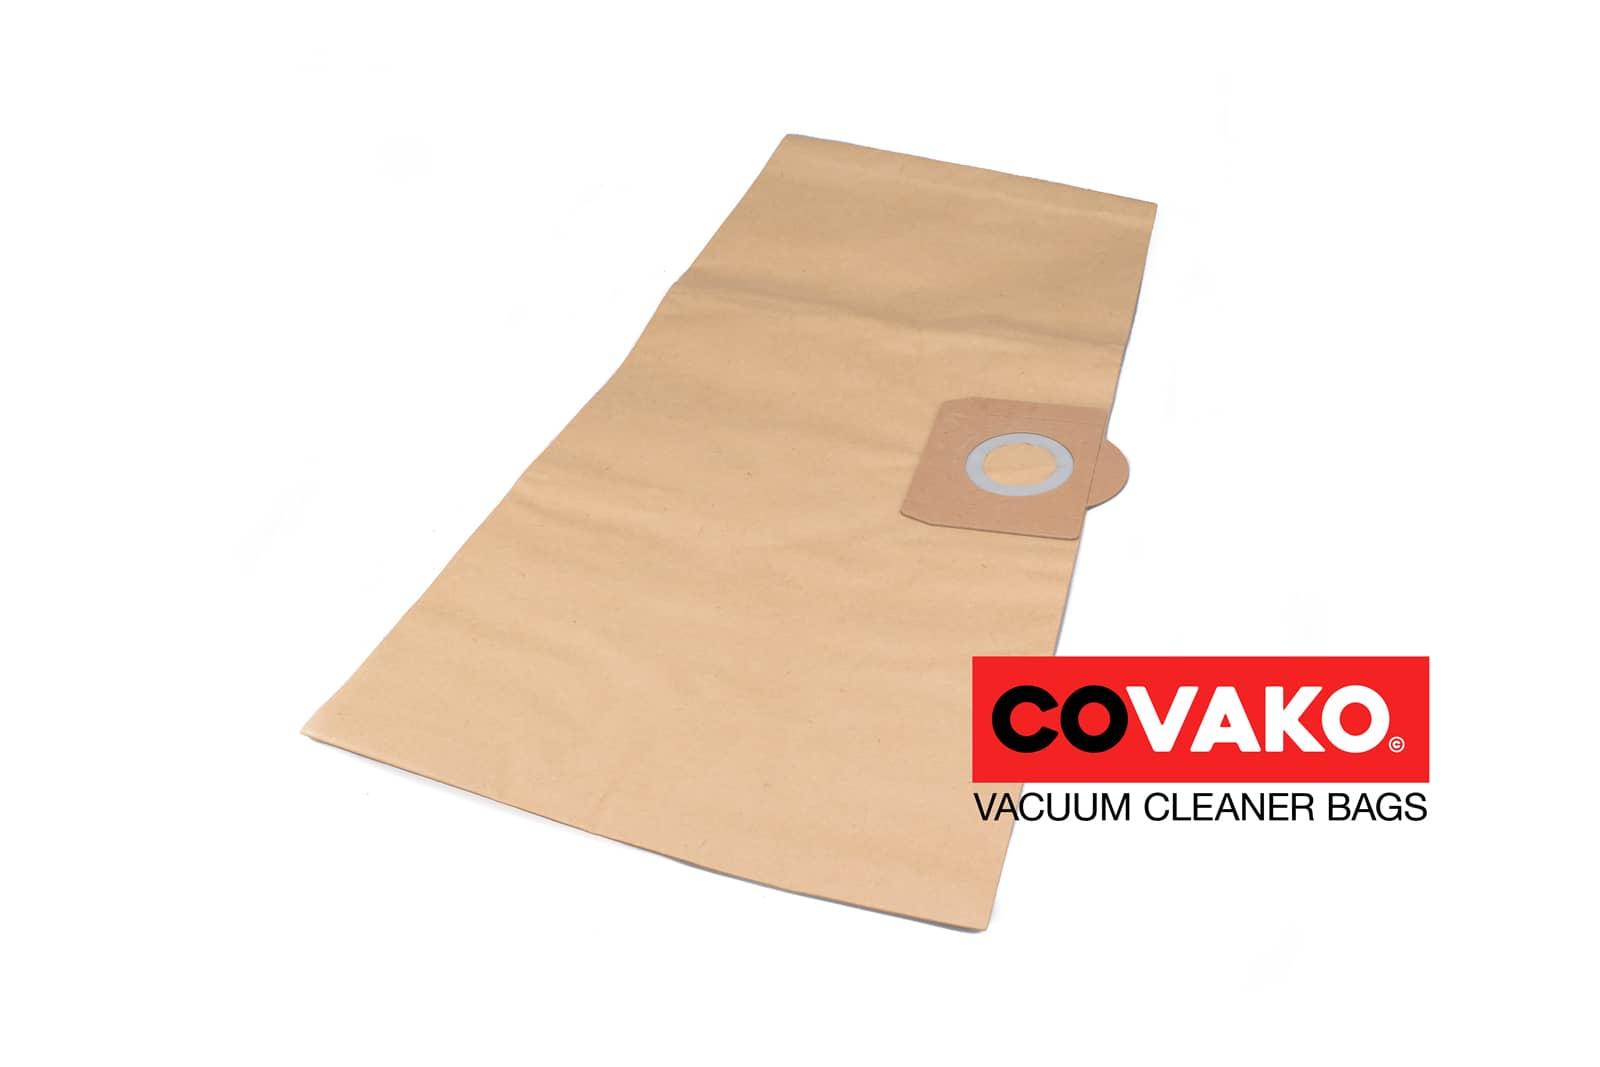 Gansow GP 1/27 W&D / Paper - Gansow vacuum cleaner bags